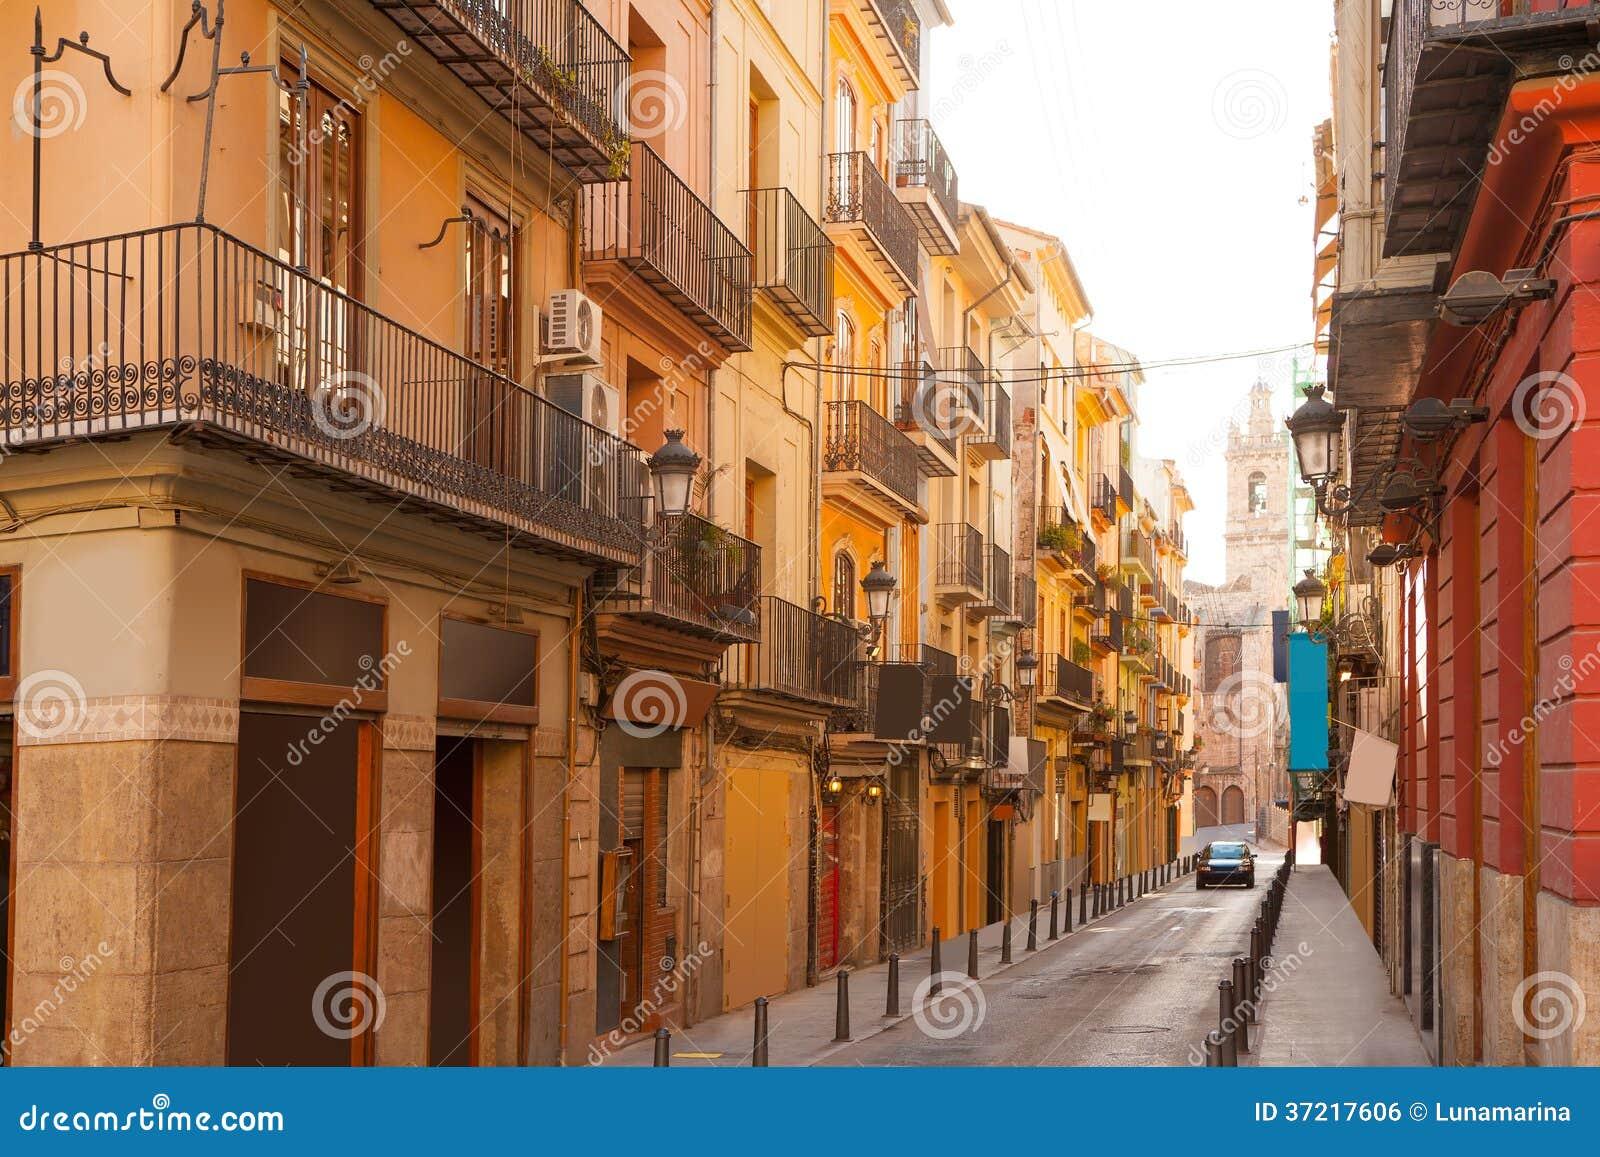 Valencia Bolseria Street In Barrio Del Carmen Downtown Stock Photo ...